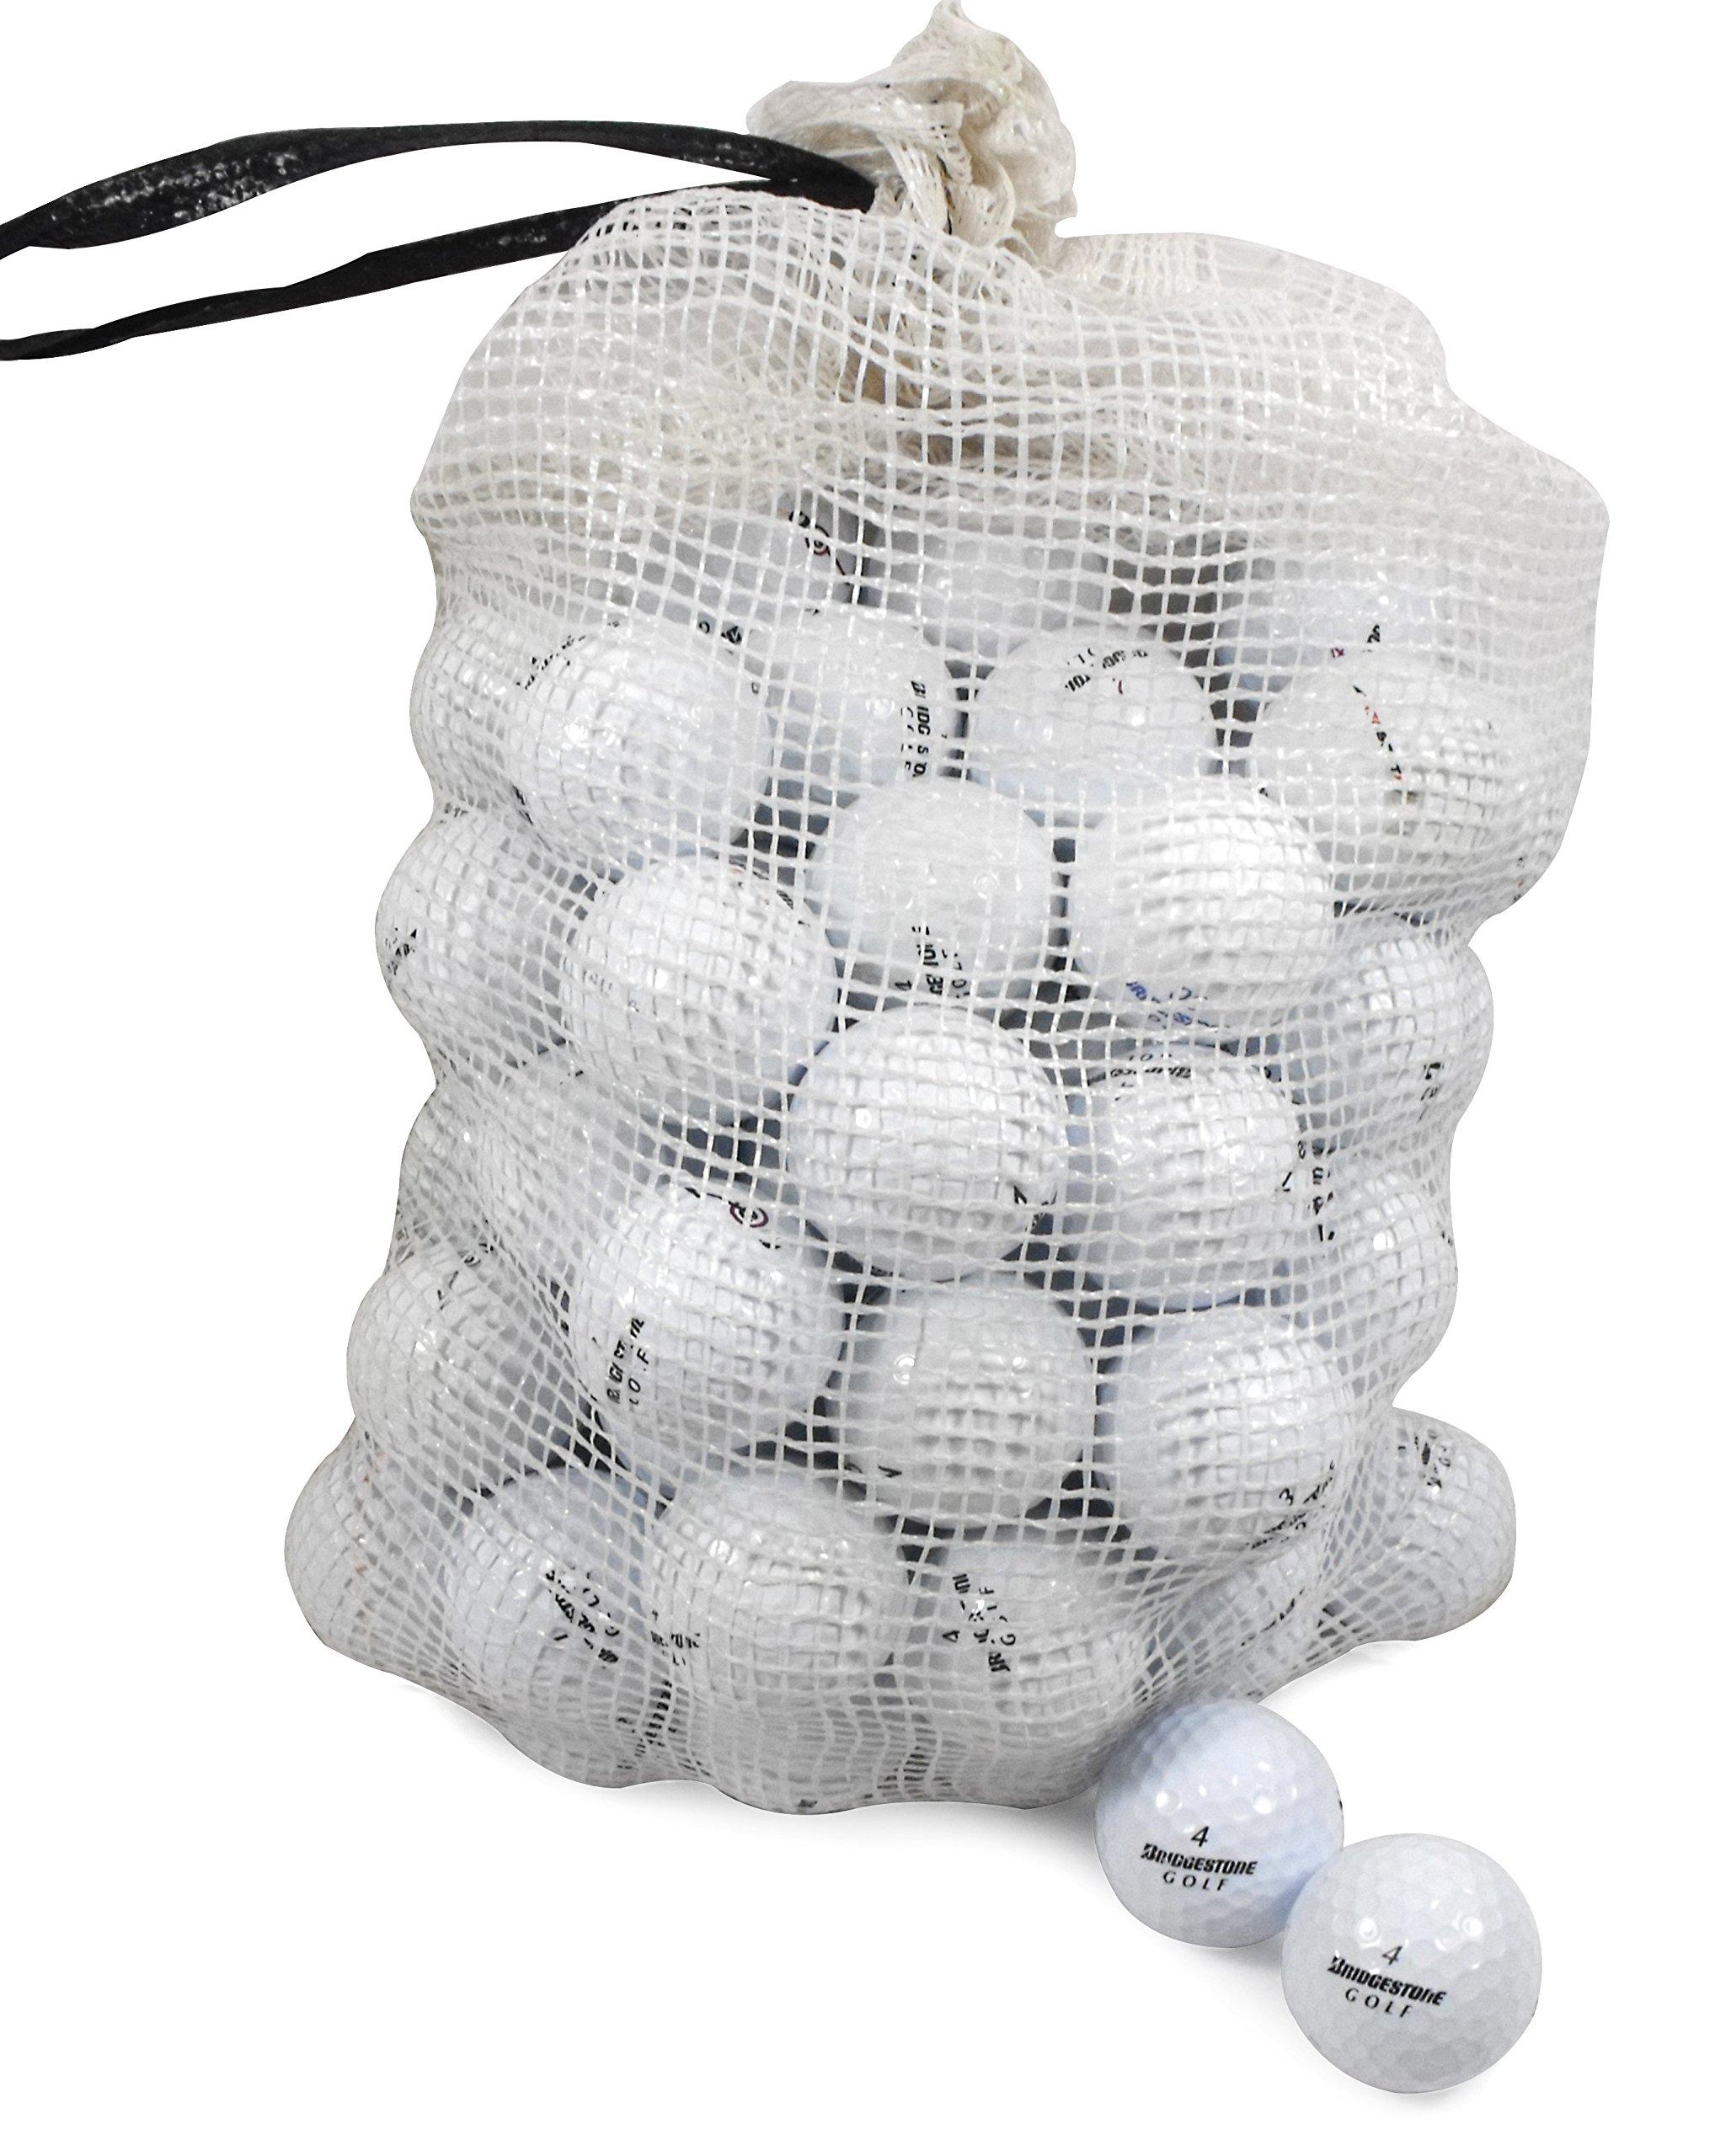 Bridgestone Recycled B/C Grade Golf Balls In Onion Mesh Bag (72 Piece), Assorted by Bridgestone